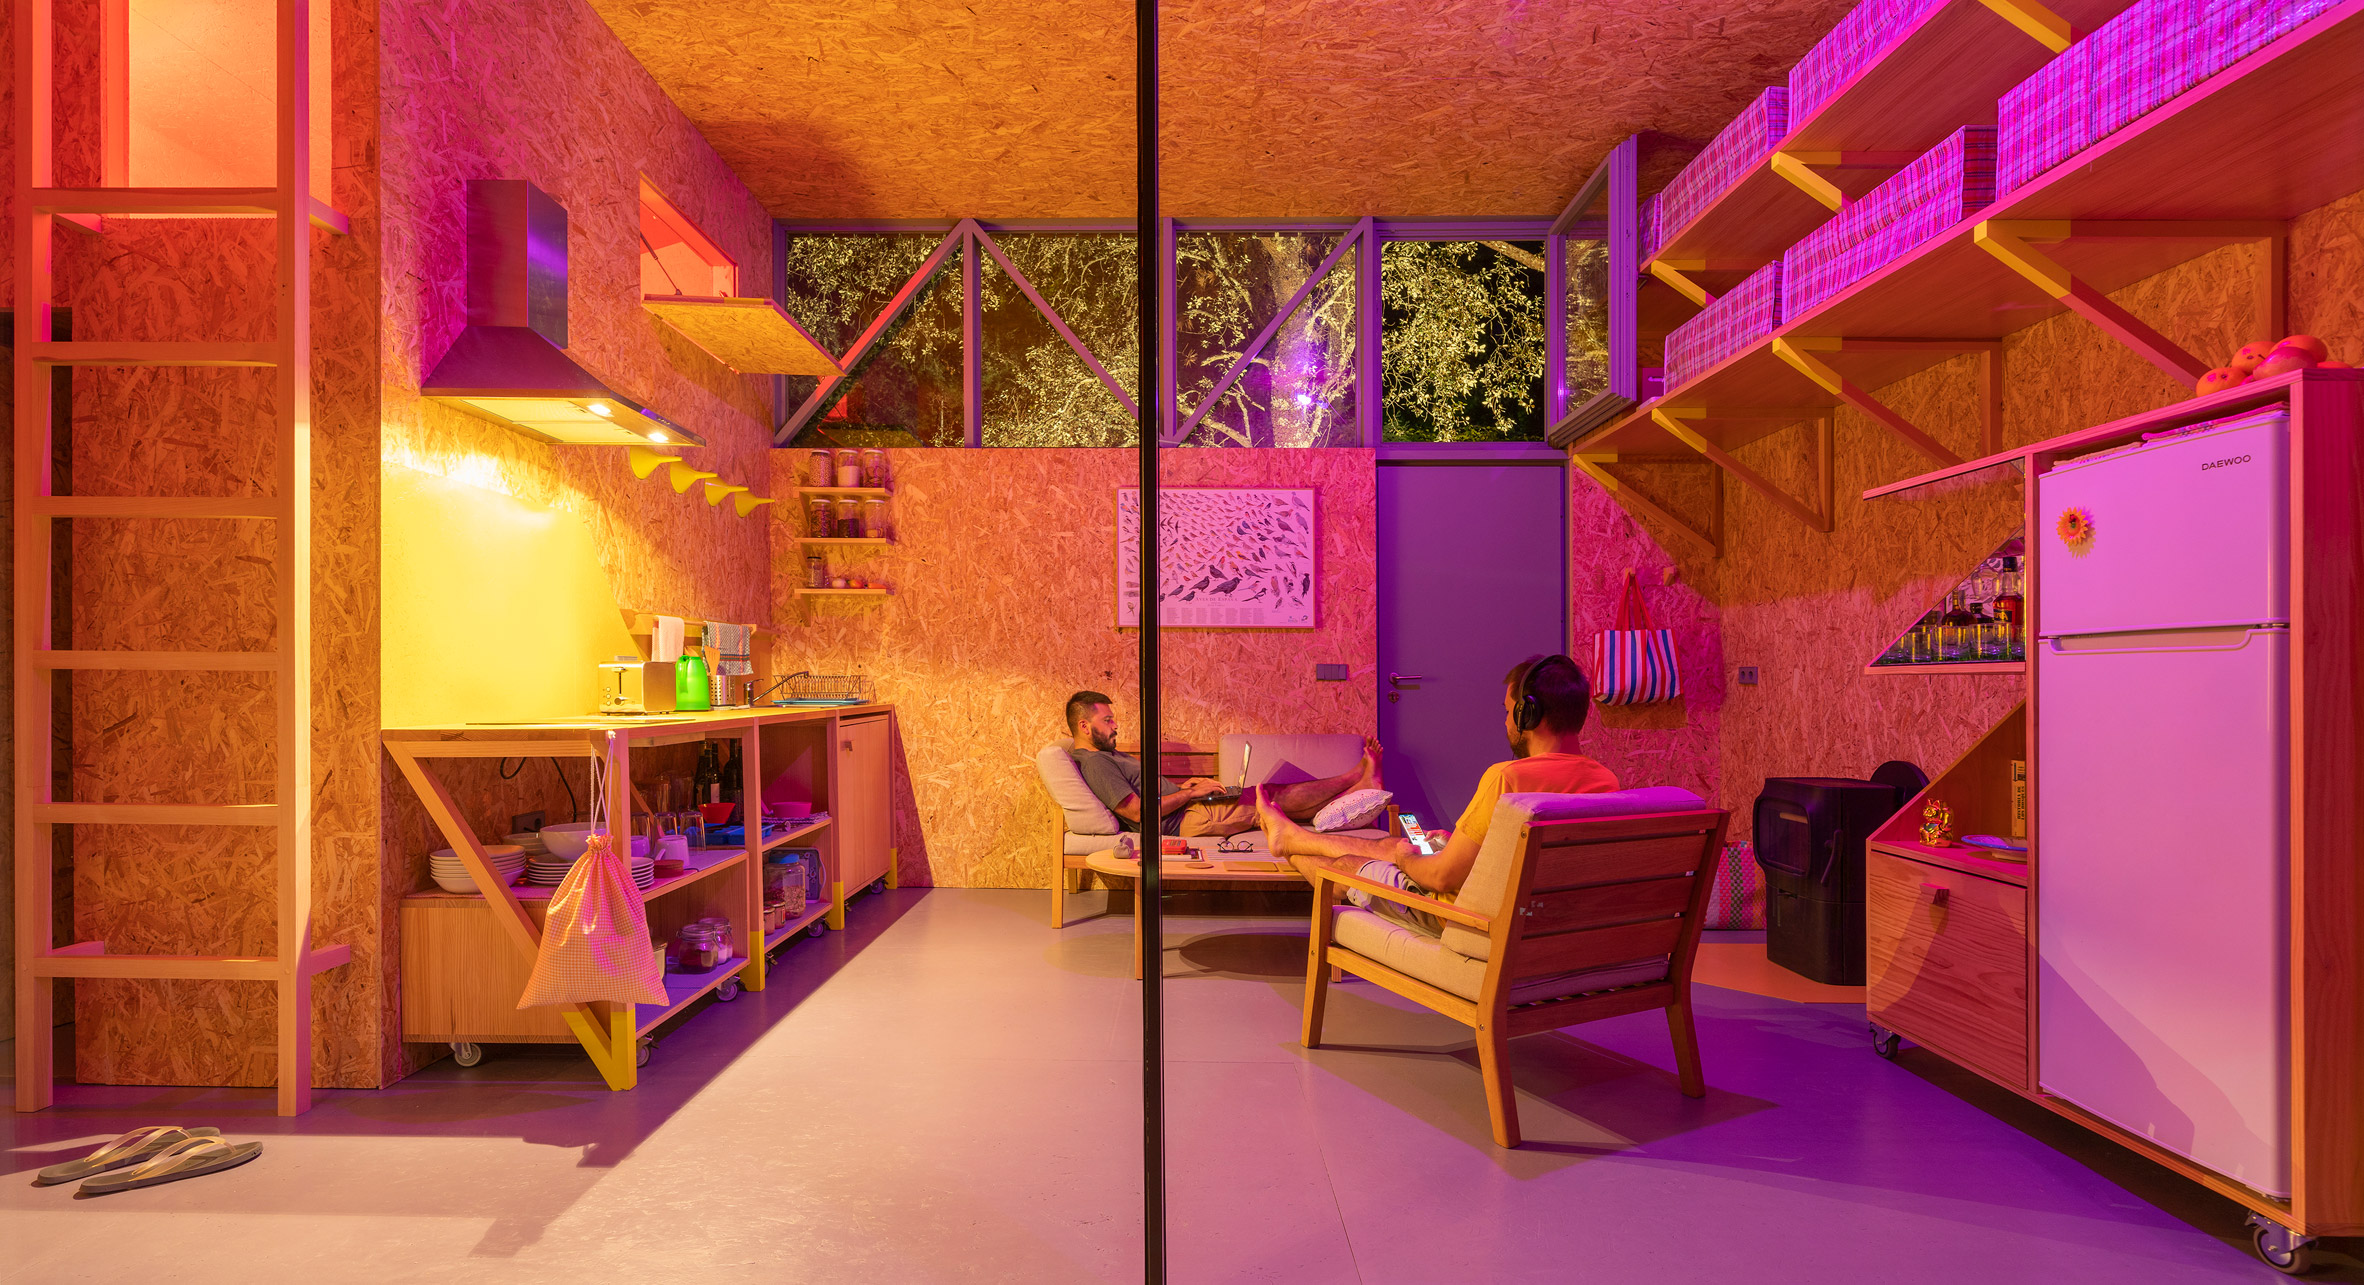 OSB living room in timber cabin